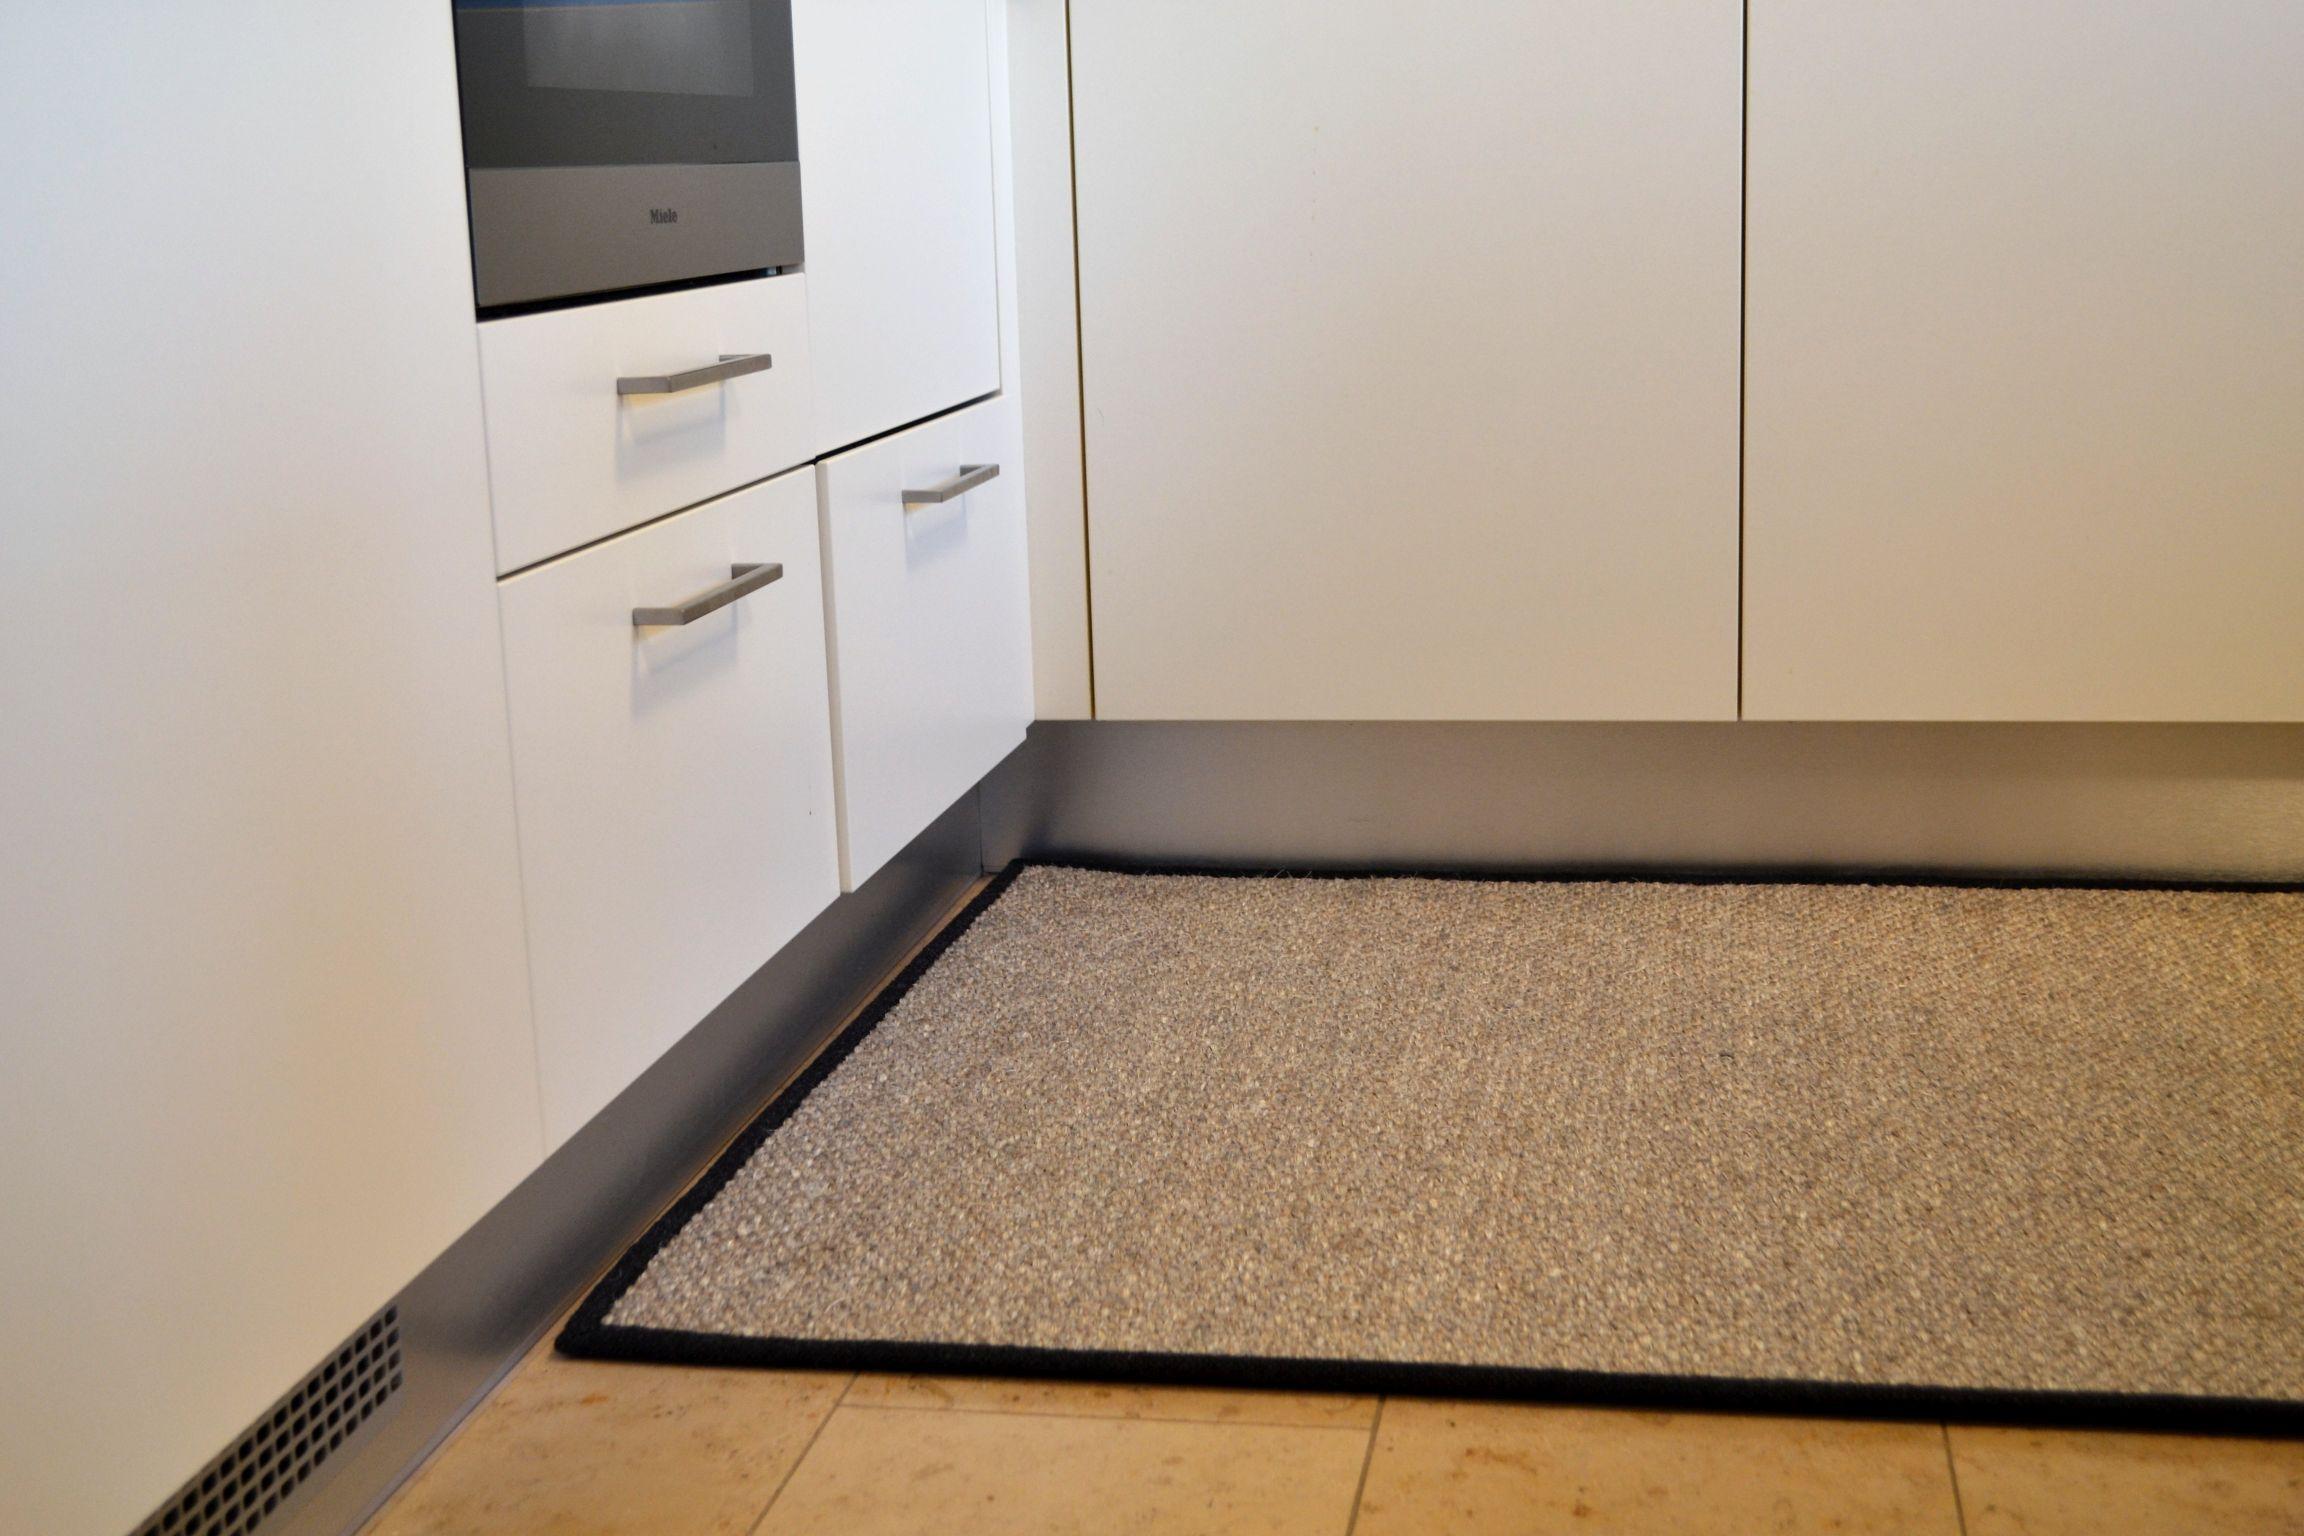 Sisalteppich Kueche - Gembinski Teppiche